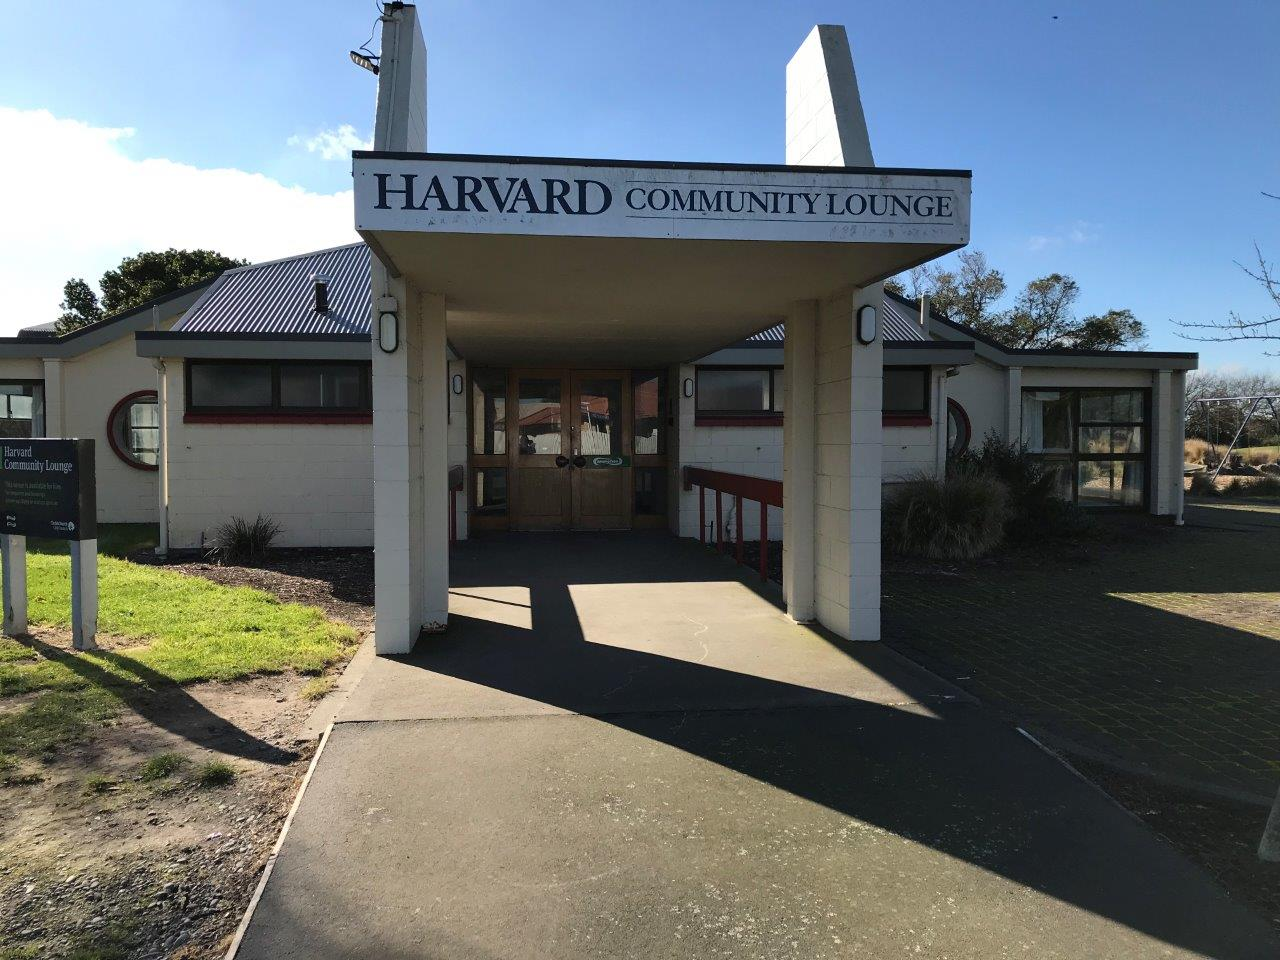 Harvard Community Lounge entrance